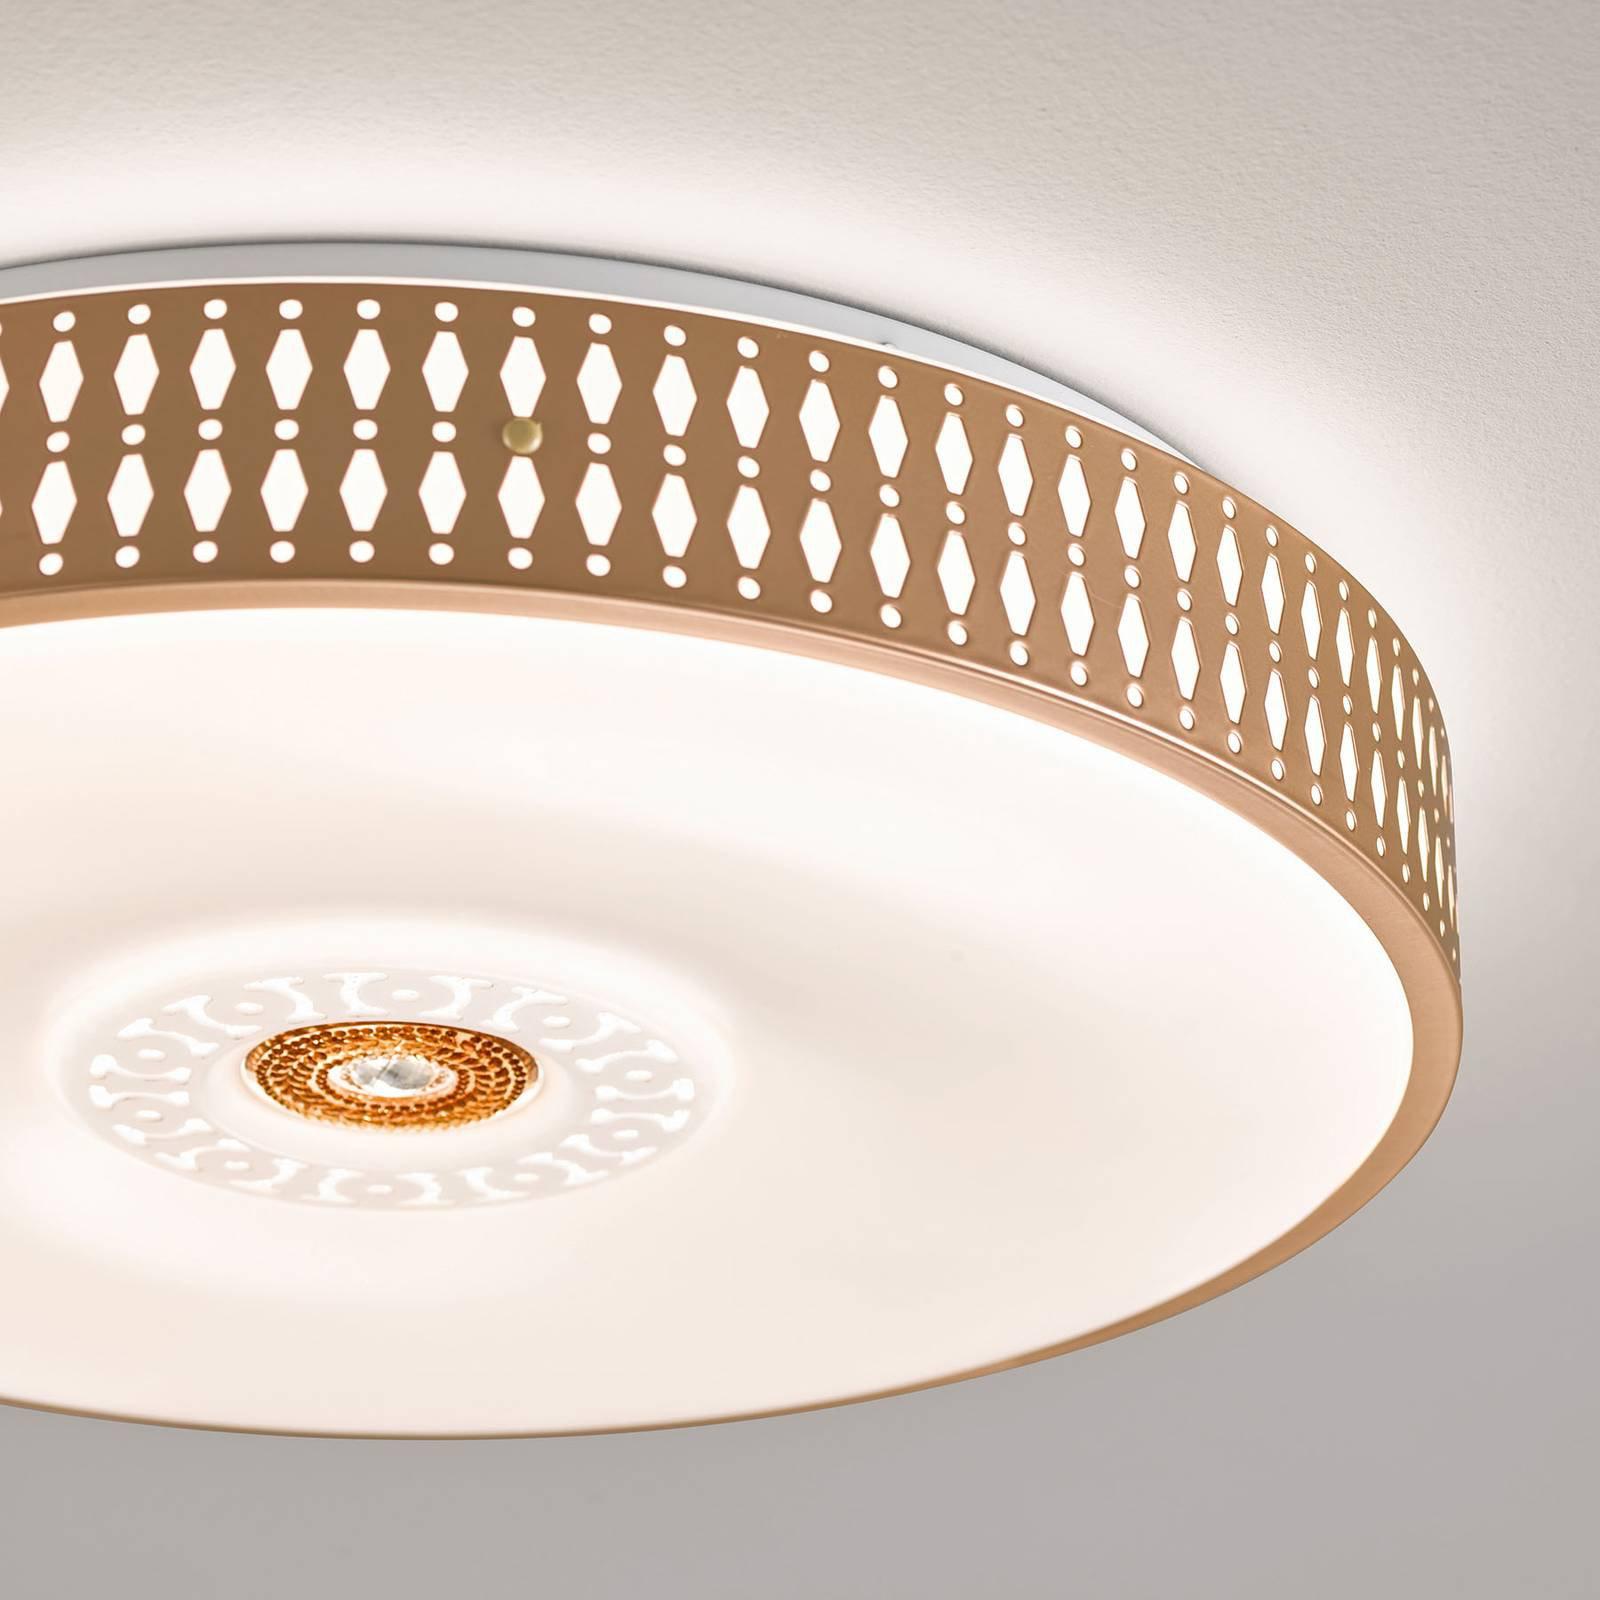 LED-taklampe Coso, dimbar, Ø 40 cm